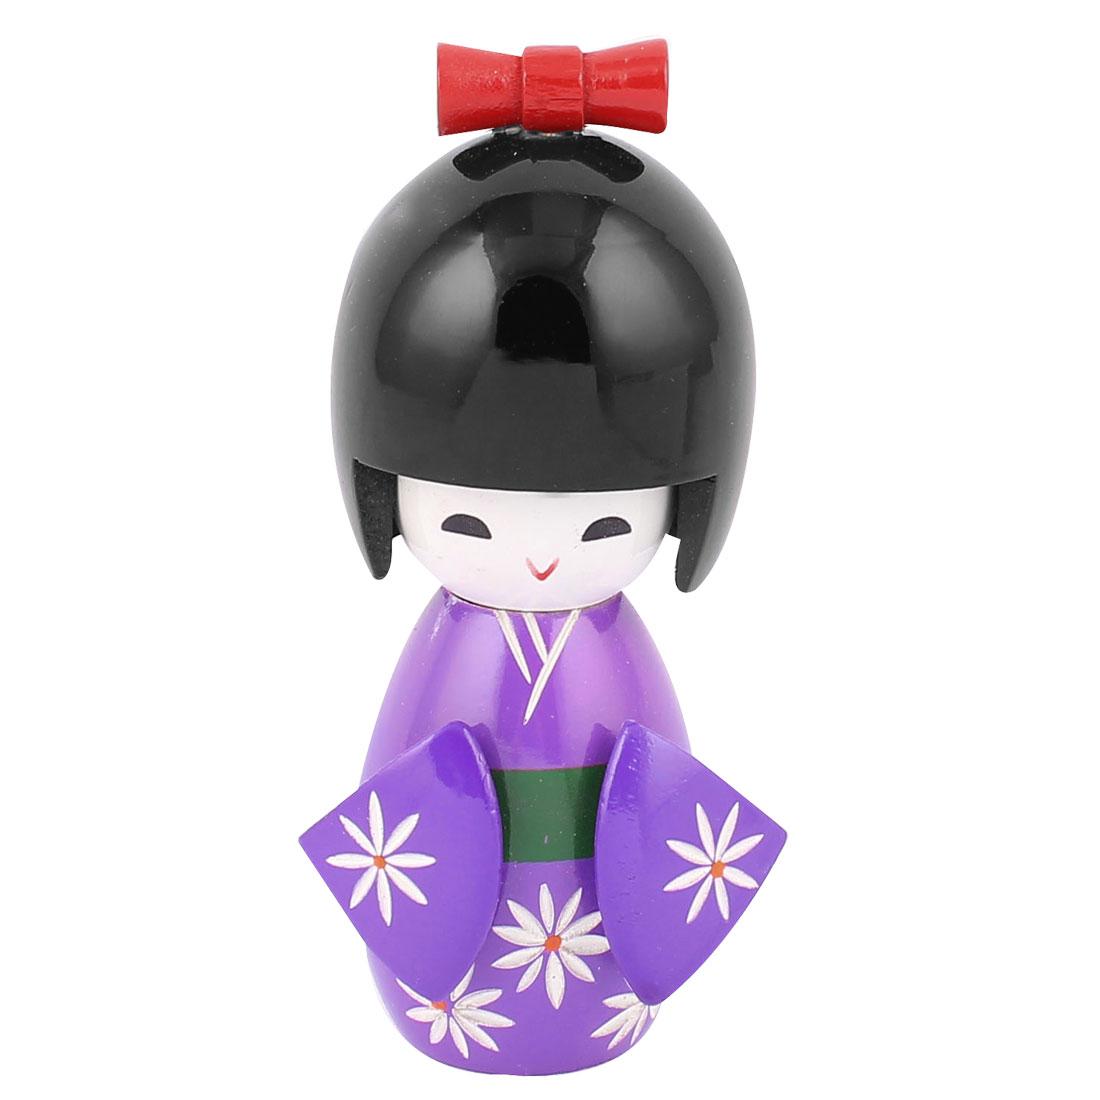 Wooden Traditional Japanese Kimono Kokeshi Doll Desk Decoration Purple